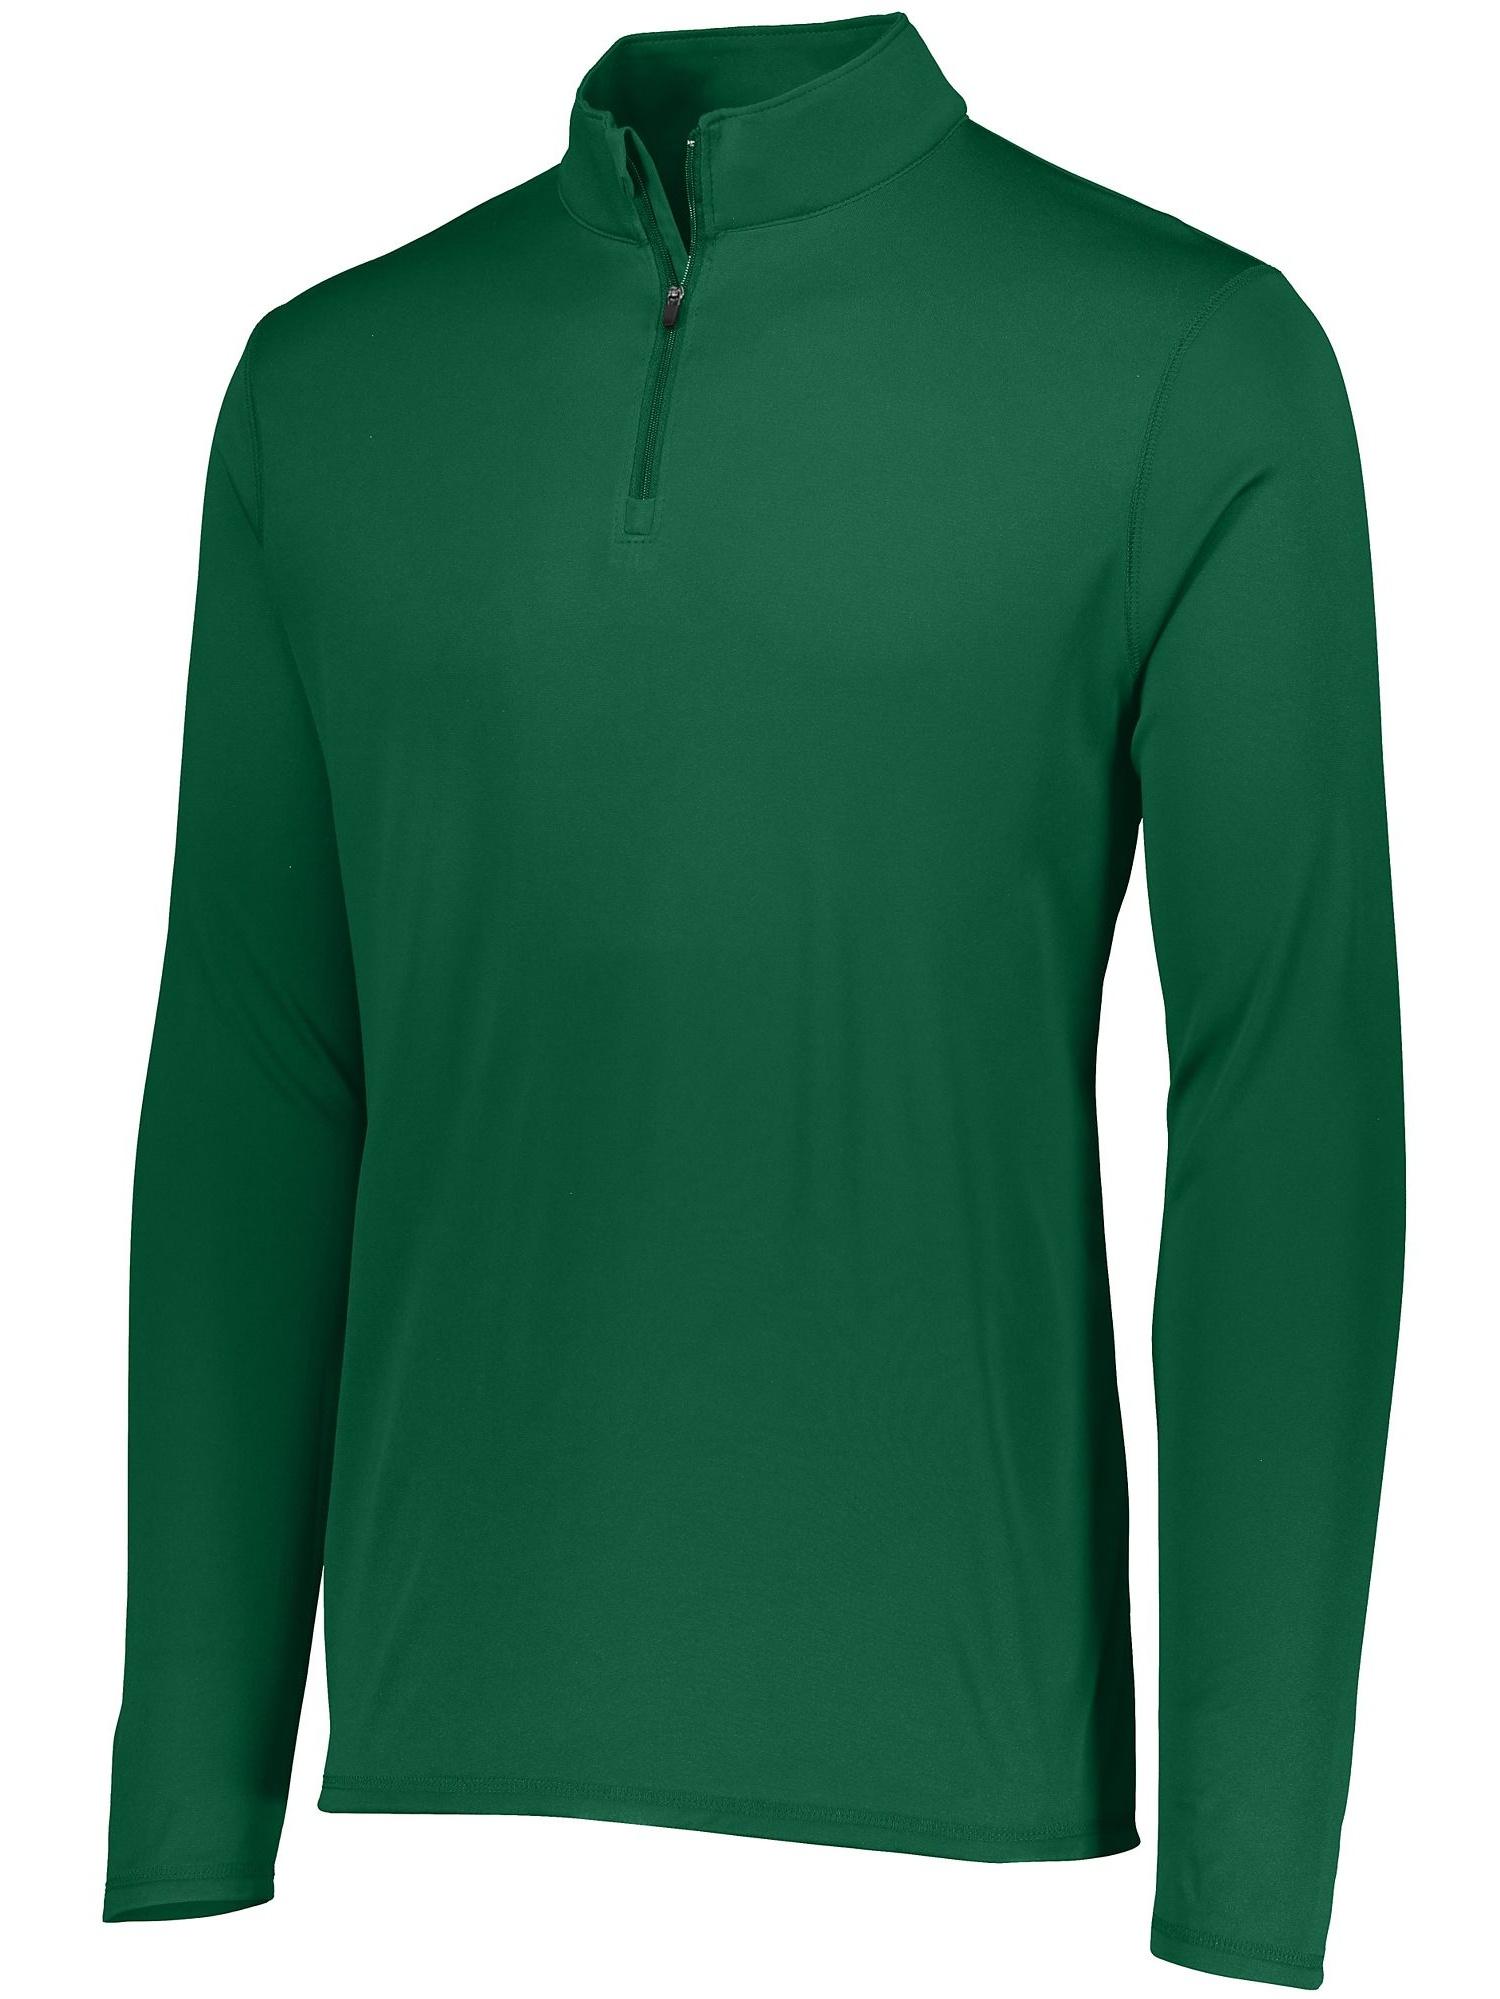 Augusta Sportswear M Boys Attain 1/4 Zip Pullover Kelly 2786